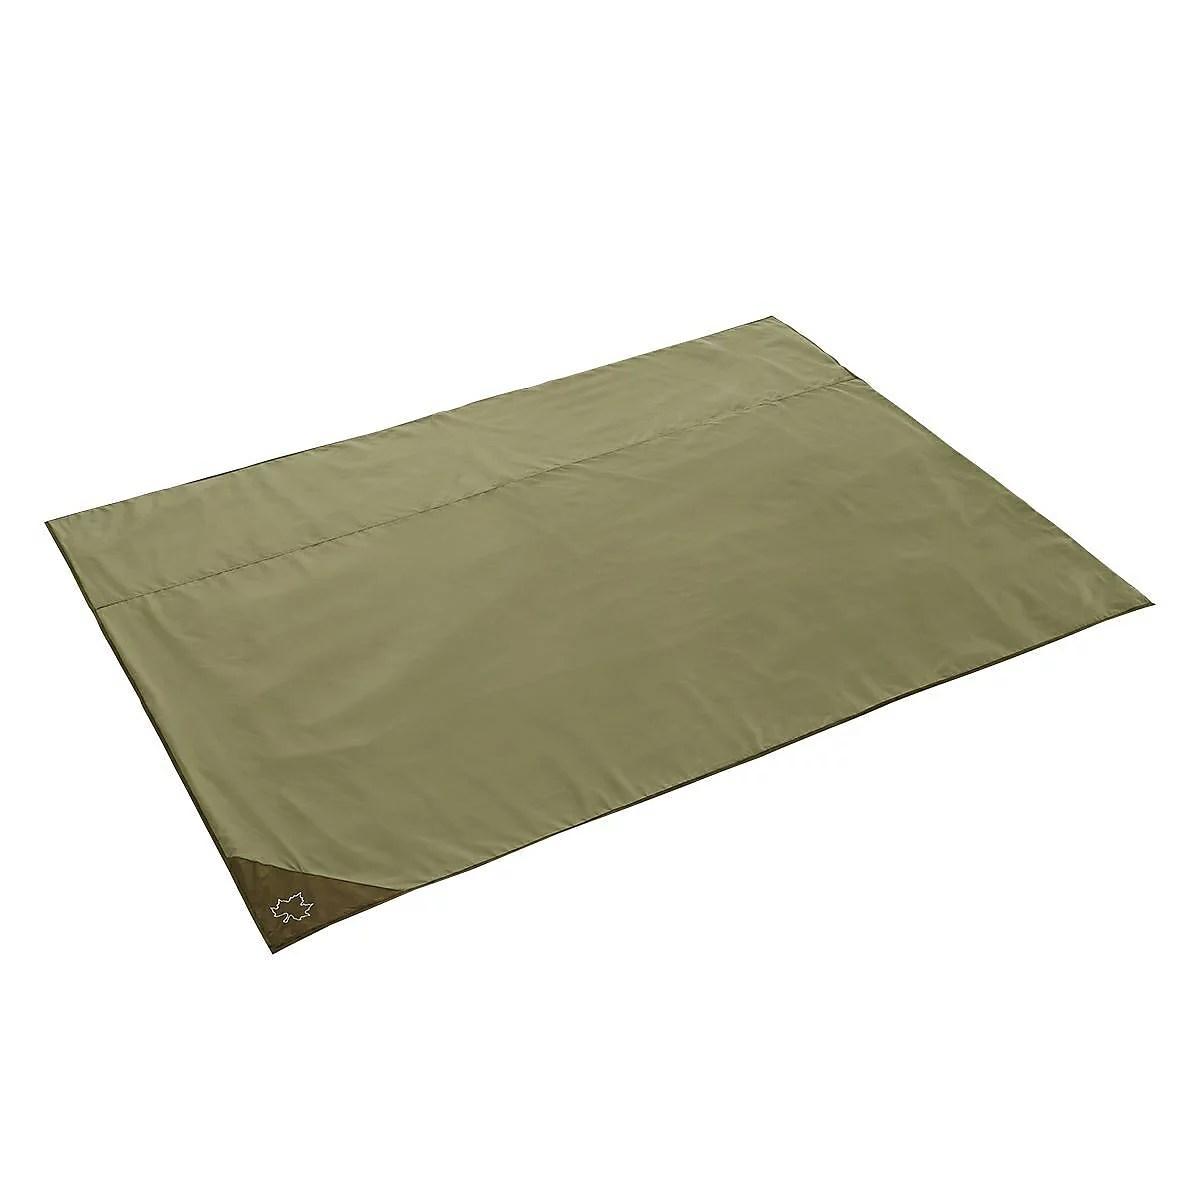 LOGOS (ロゴス) テントぴったり防水マット・L キャンプ用品 インナーマット 71809604